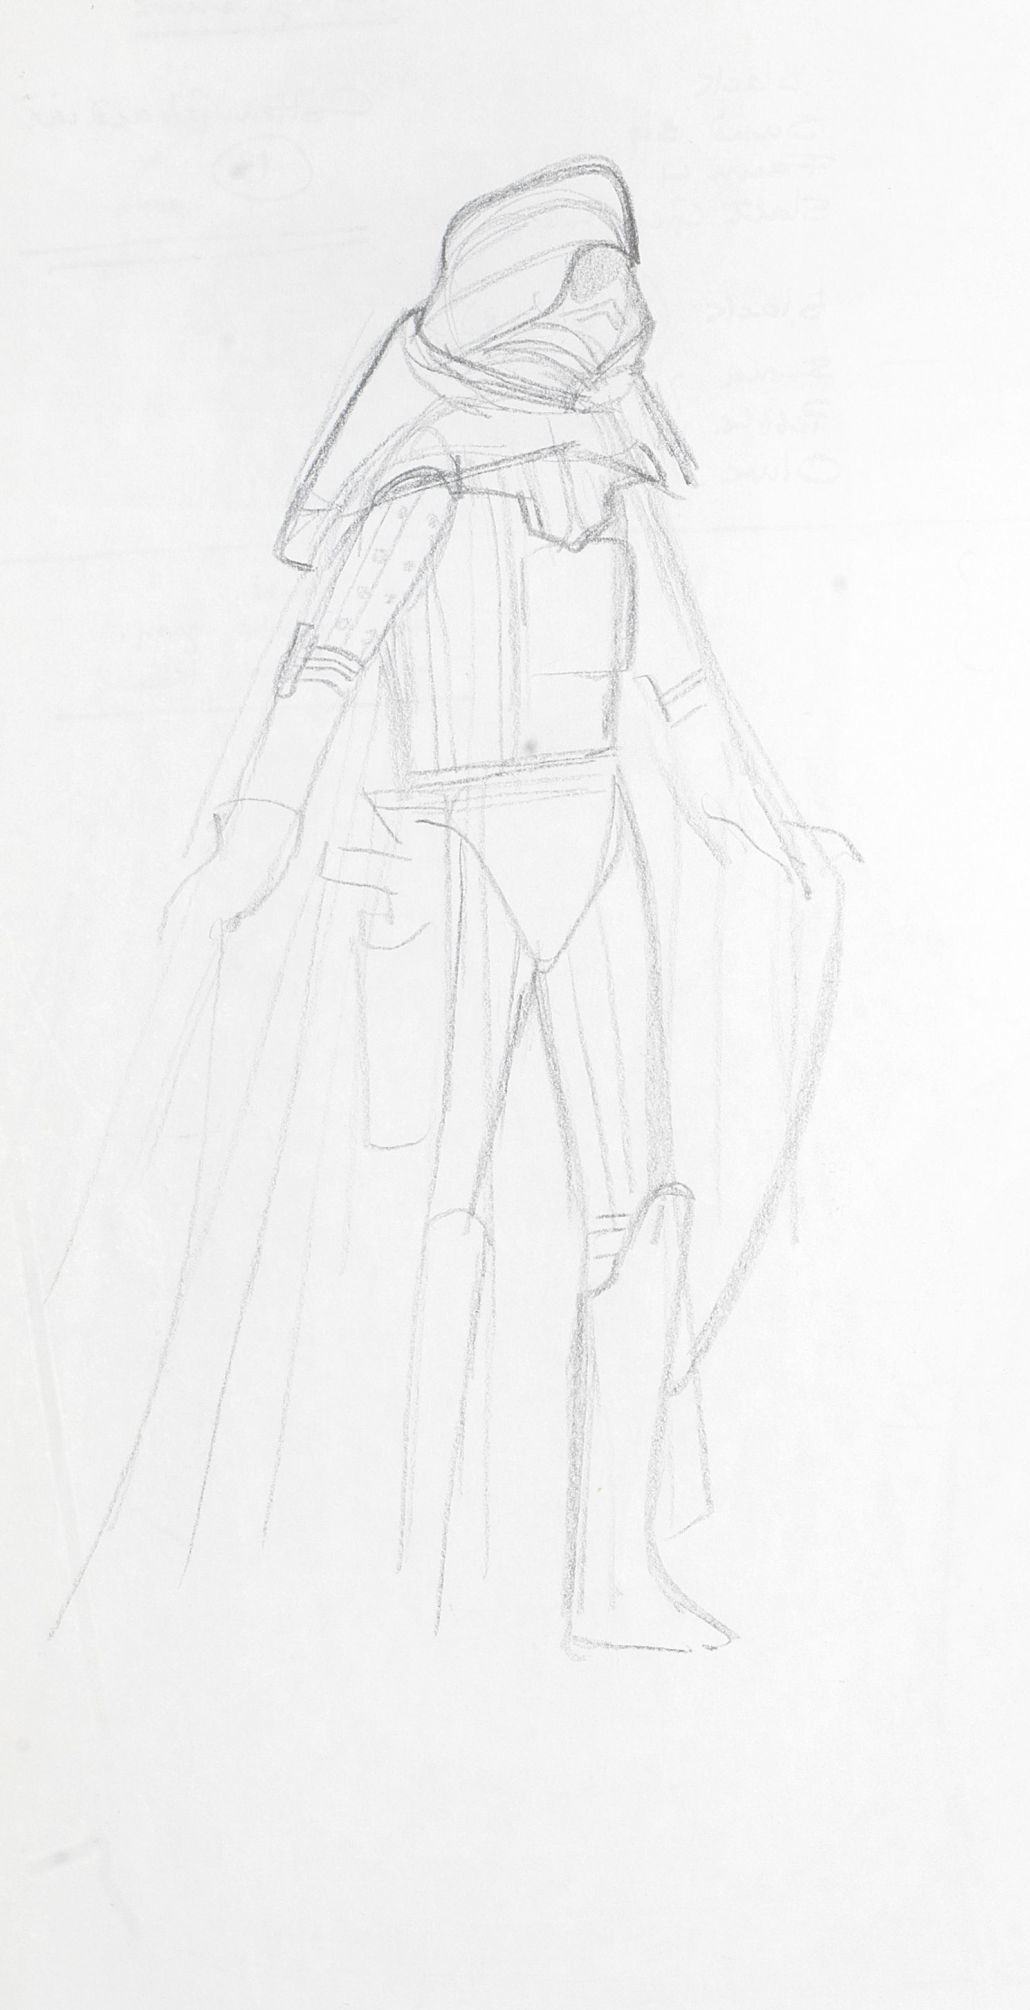 STARWARS COSTUME DESIGNER 2